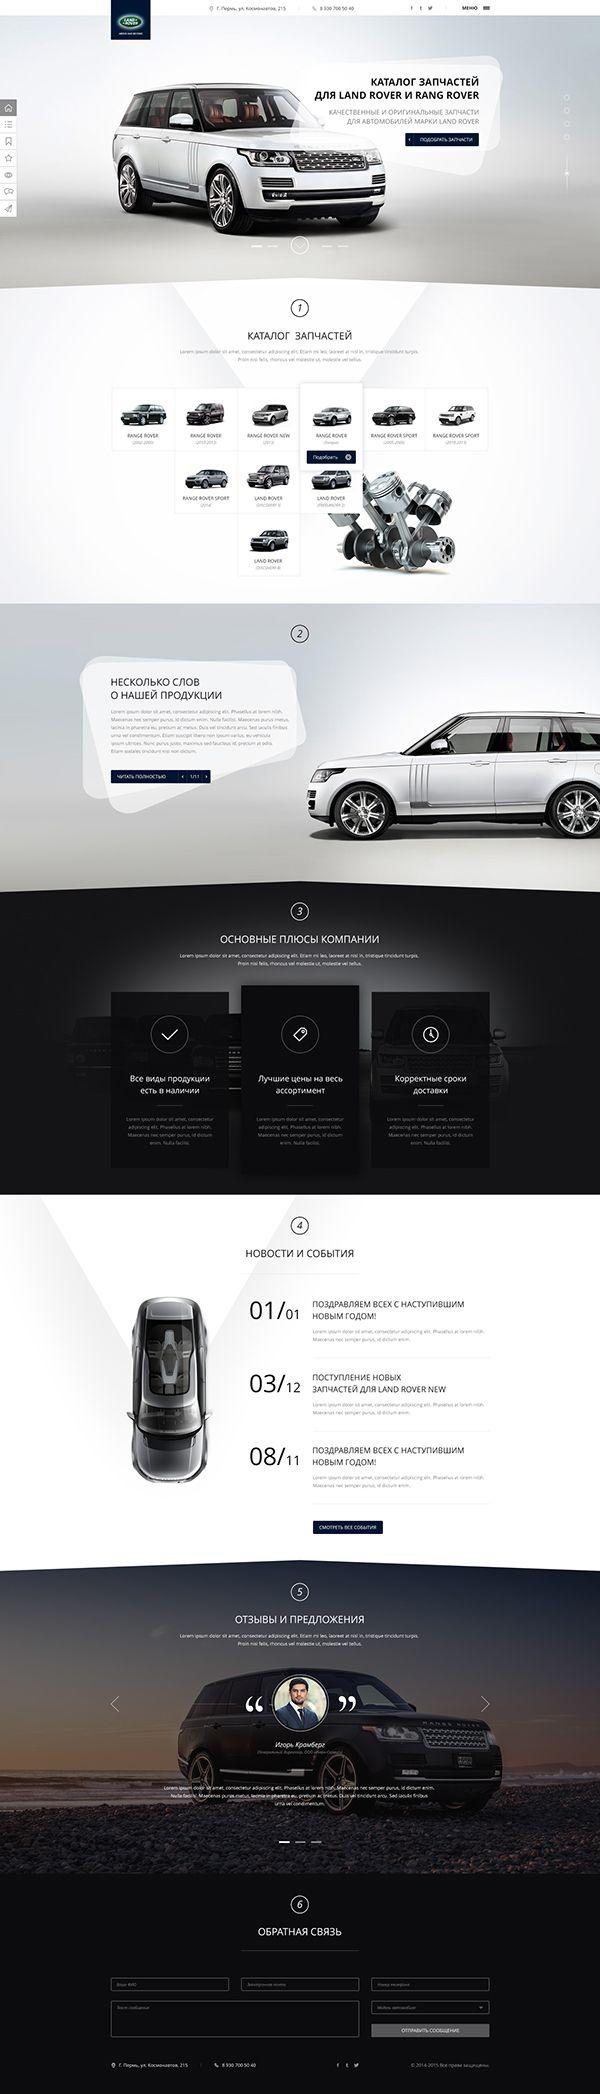 213 best Web Design-Vehicle- images on Pinterest | Vehicles, Website ...